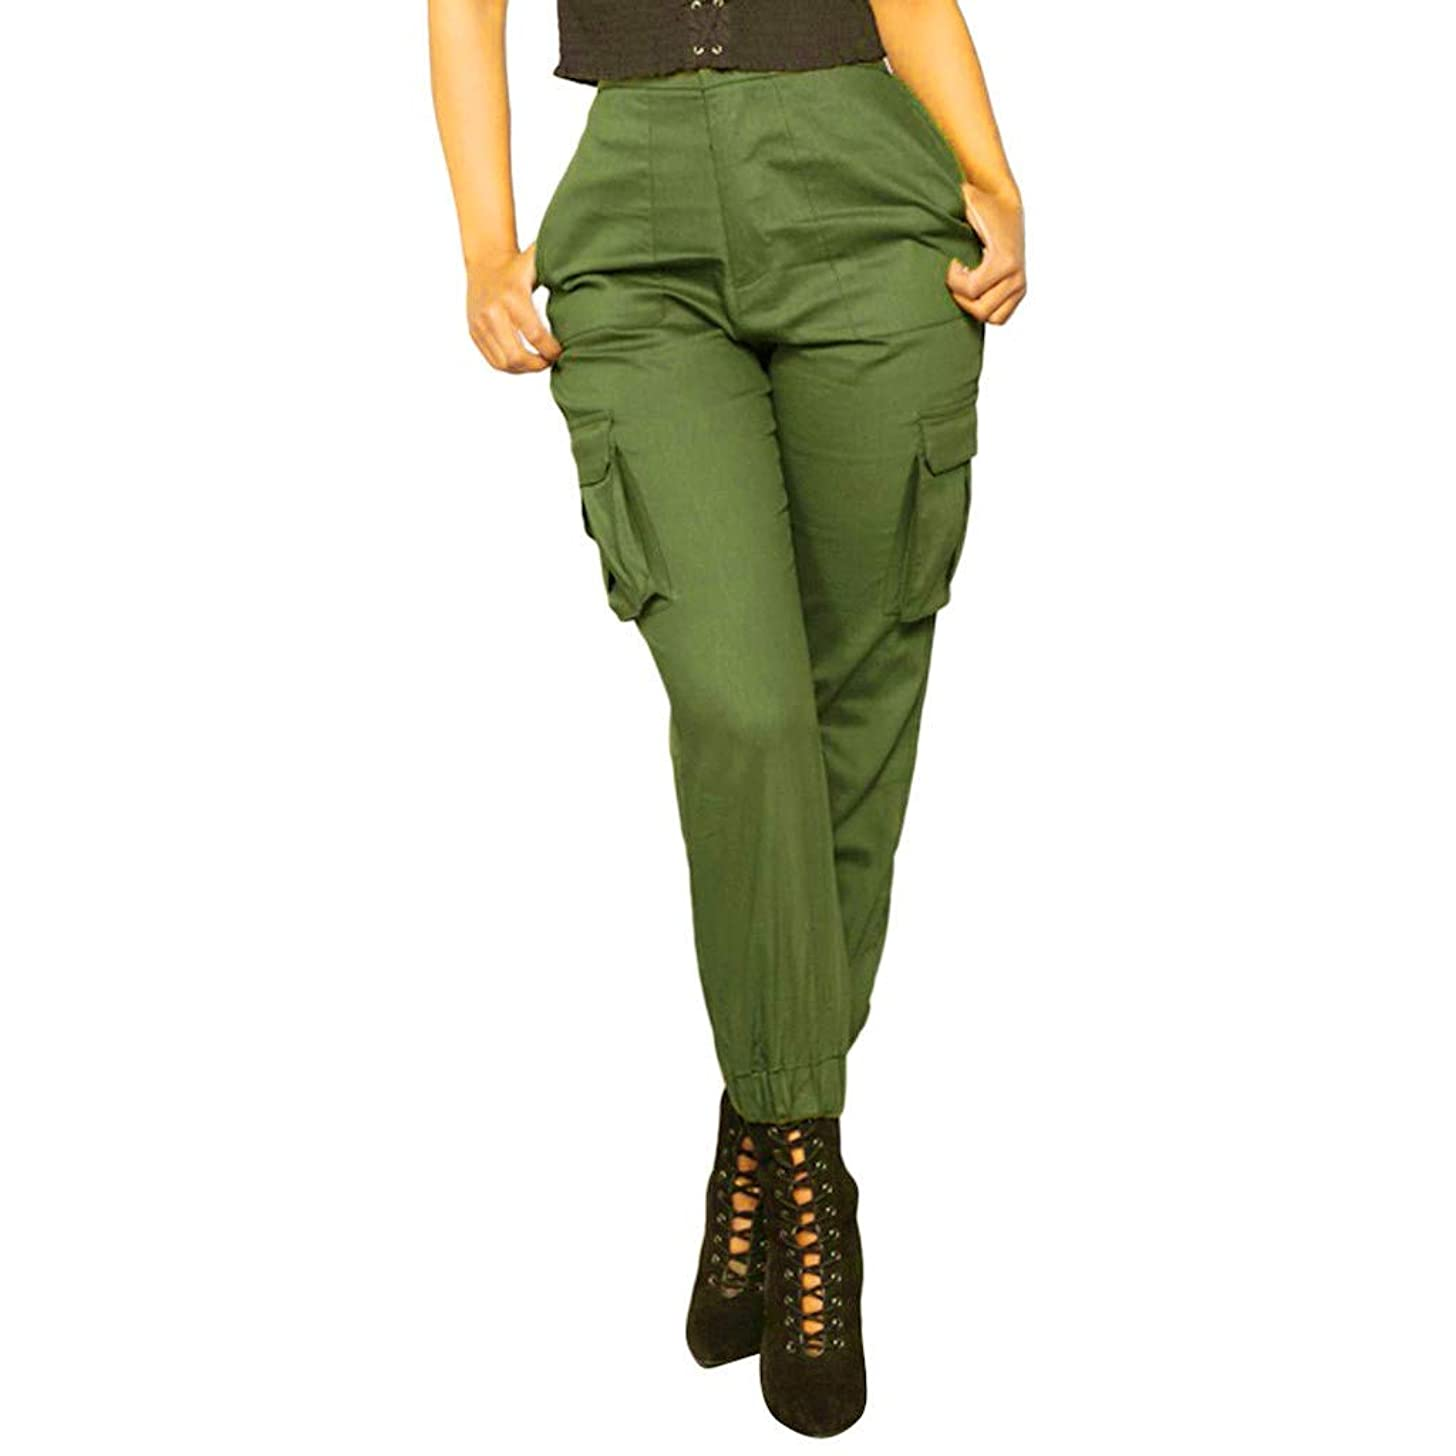 F_topbu Women Casual Pants with Pockets Soild Trousers Sports Elastic Waistt Pants Overalls Pockets Cargo